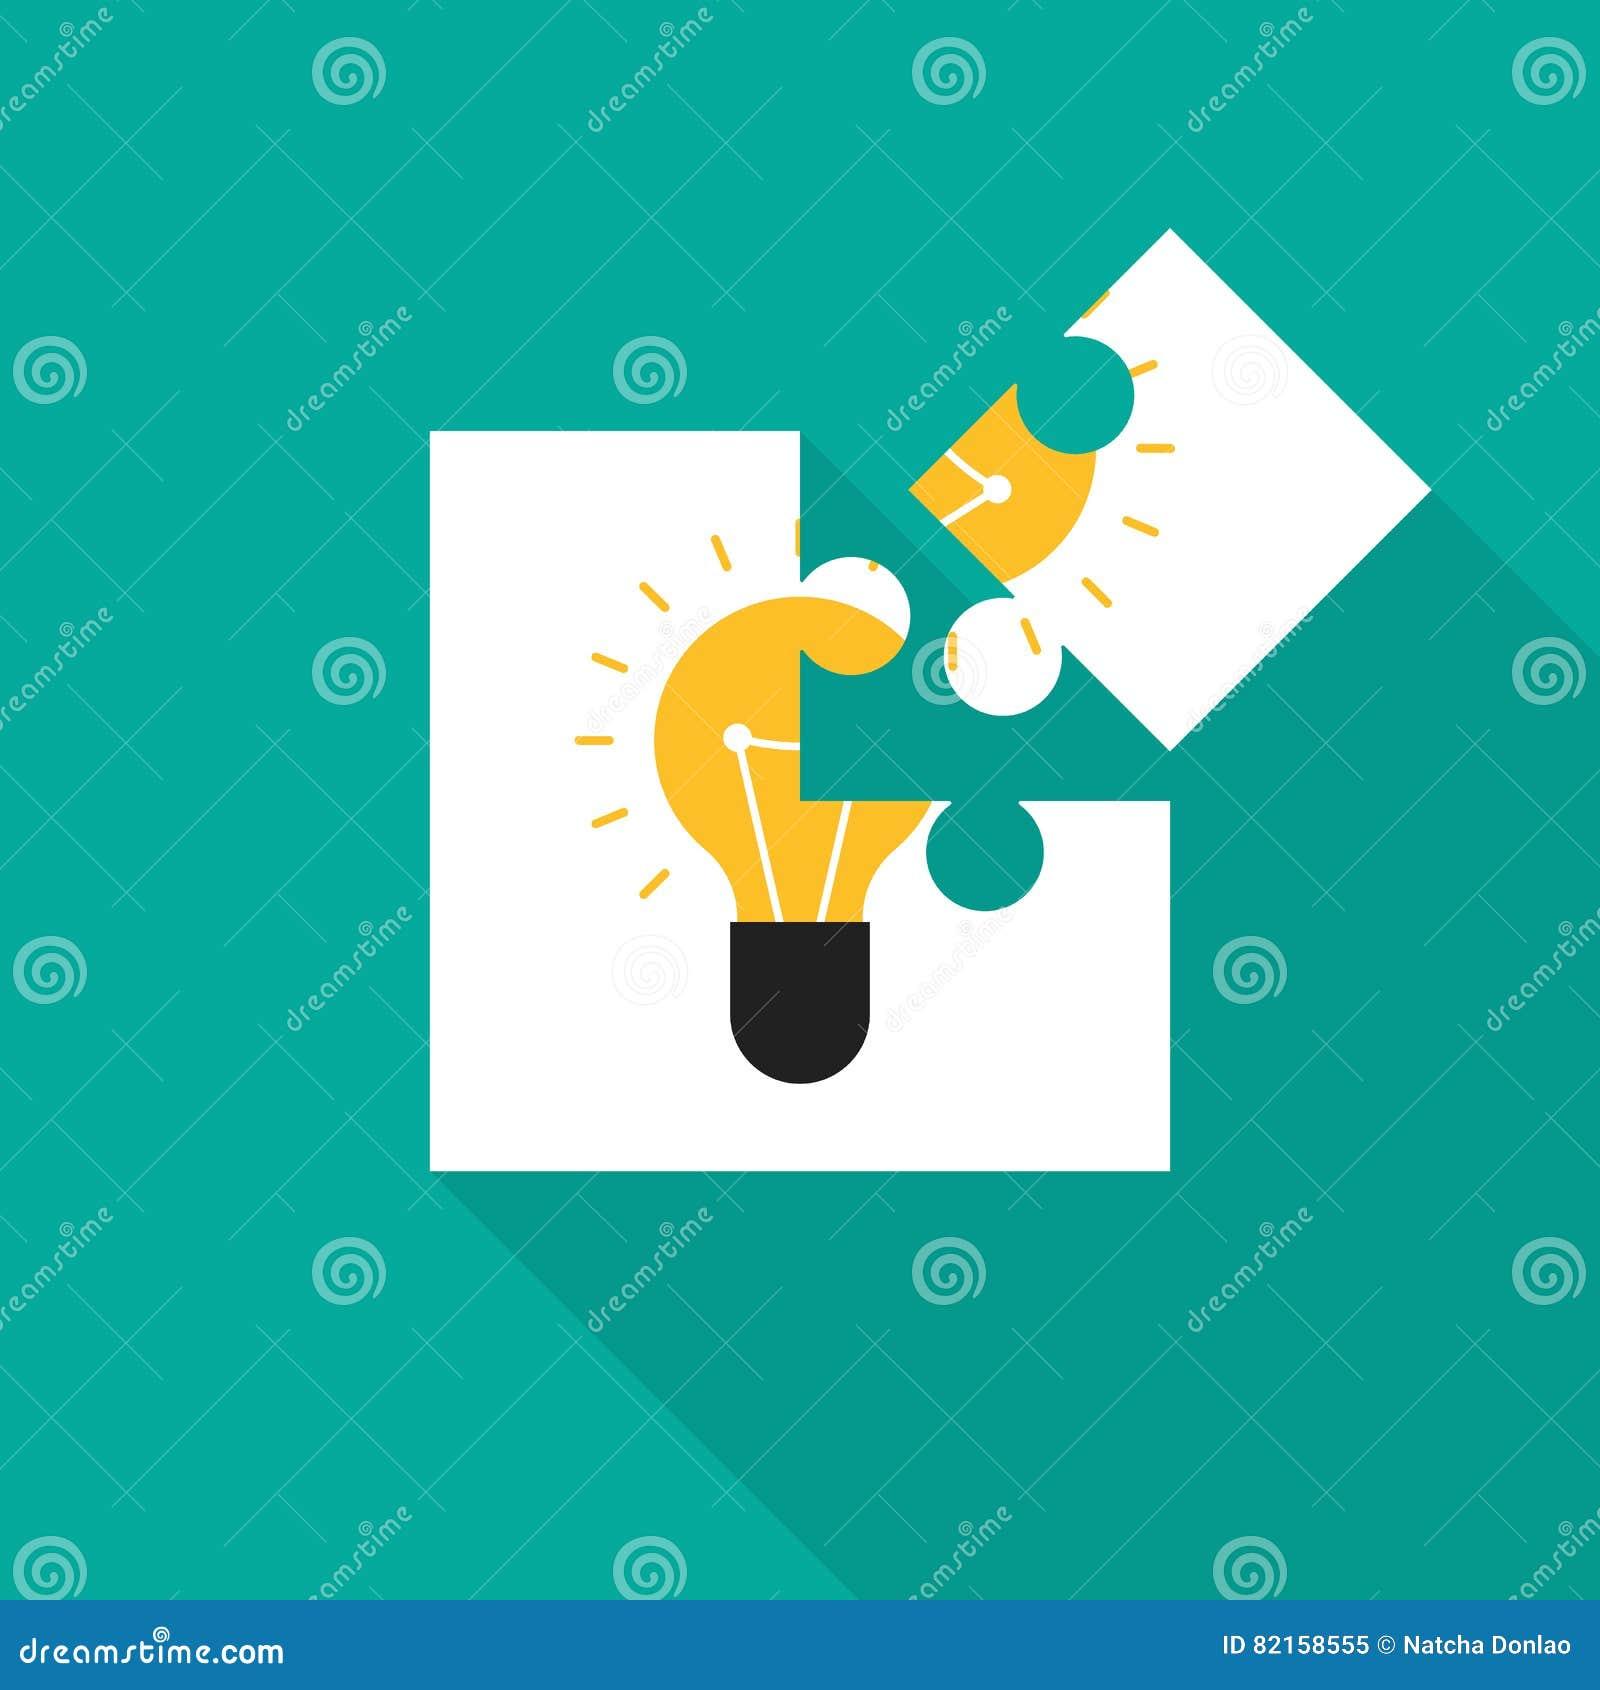 Creative Idea Concept Inspiration Process Vector Illustration